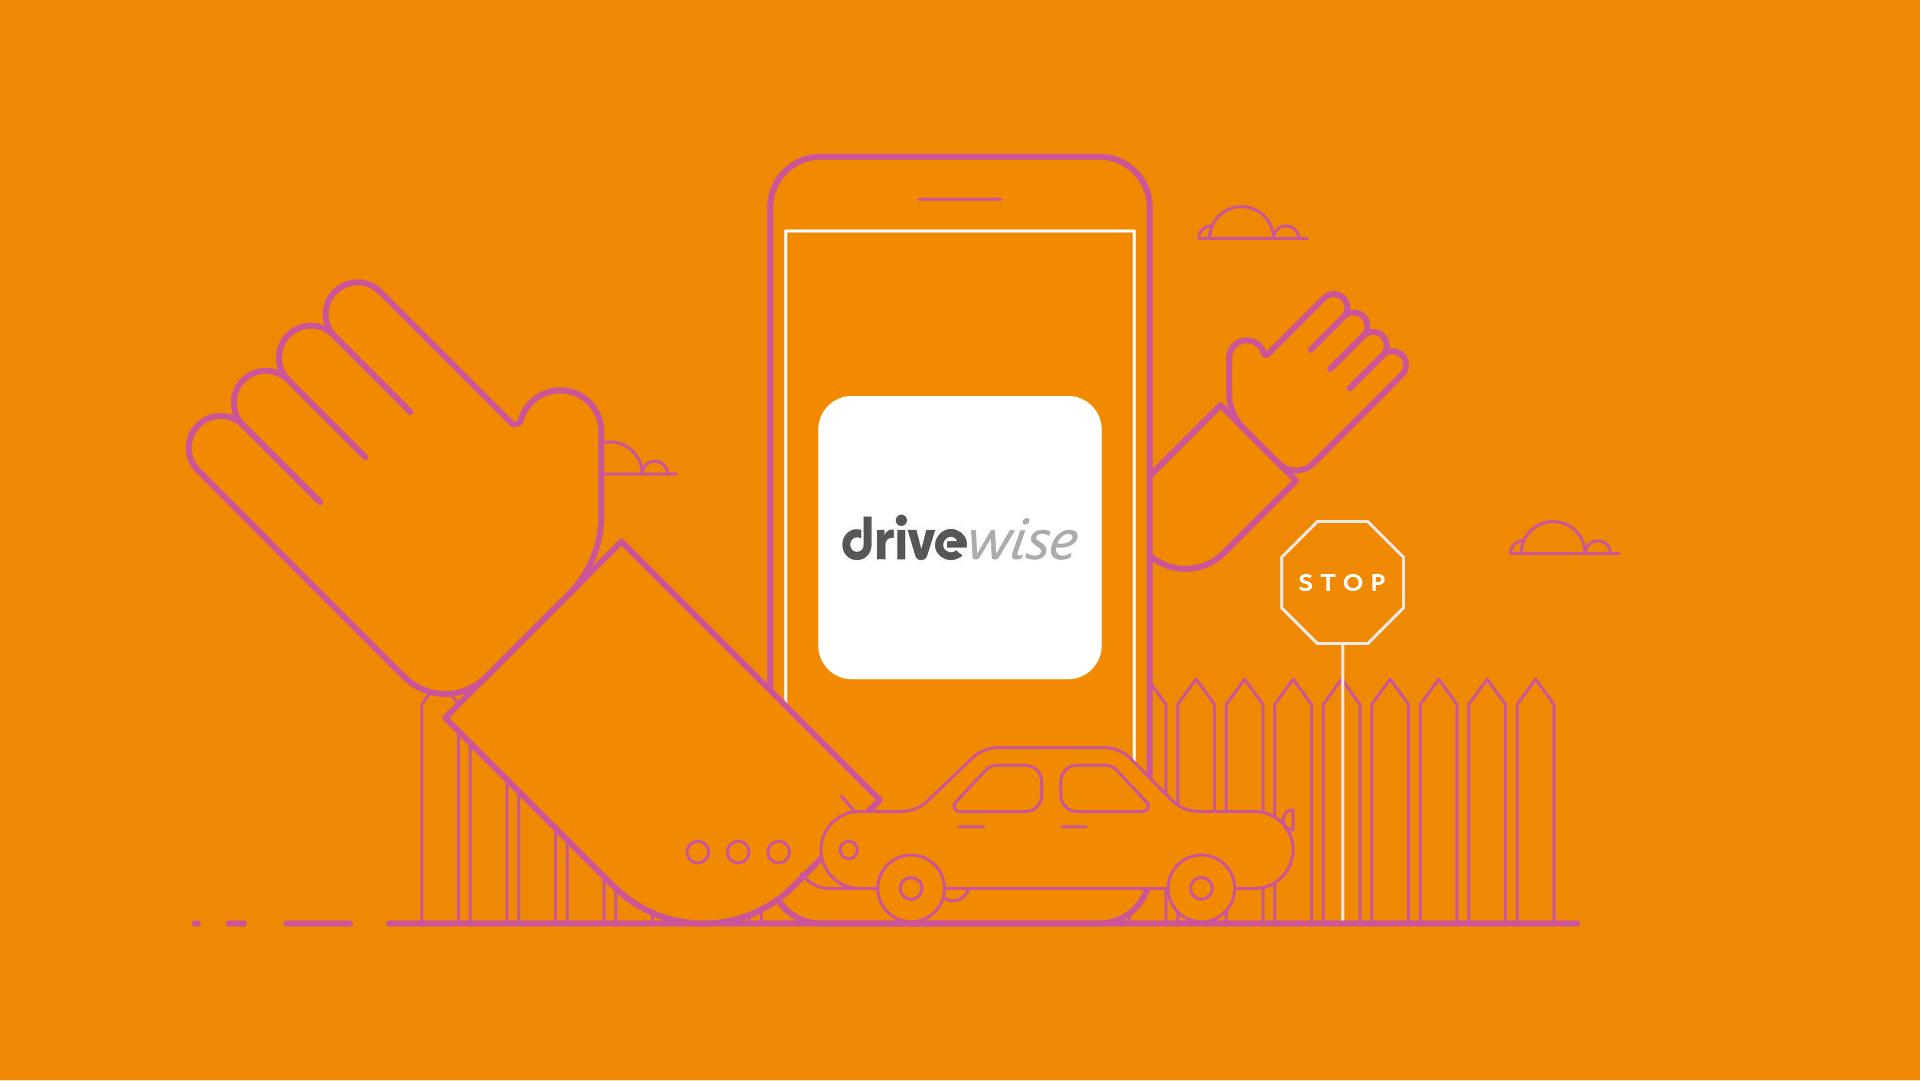 CAR-180410_ALLSTATE_DRIVEWISE_PITCH_REVISIONS_cv_v04-07.jpg